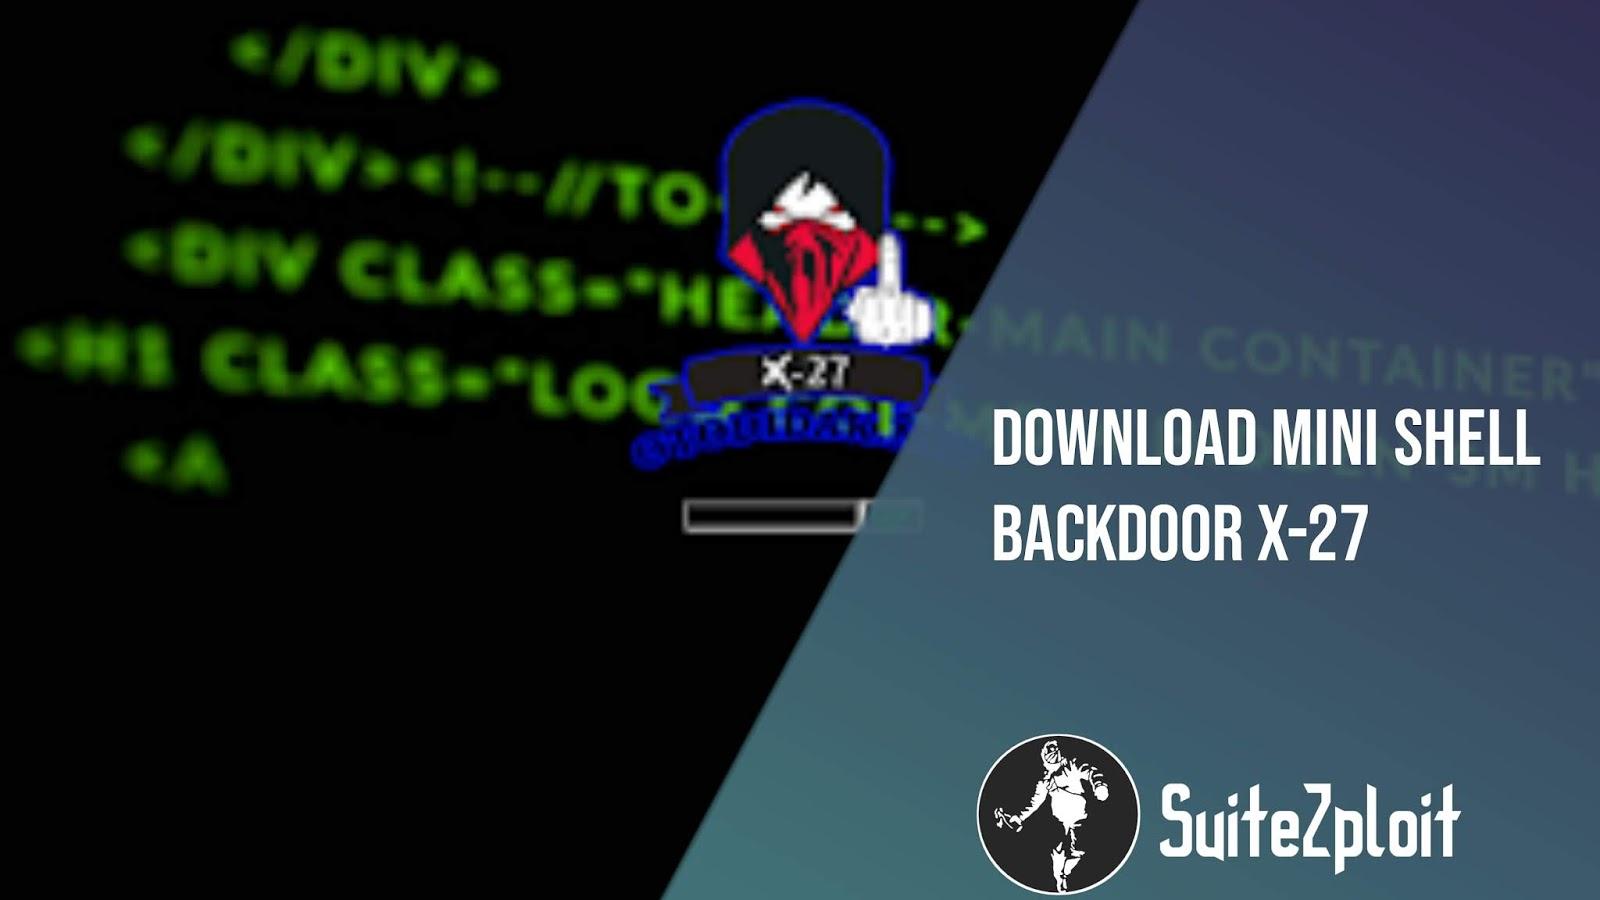 Download Mini Shell Backdoor X-27 - Fiture Login & Logout